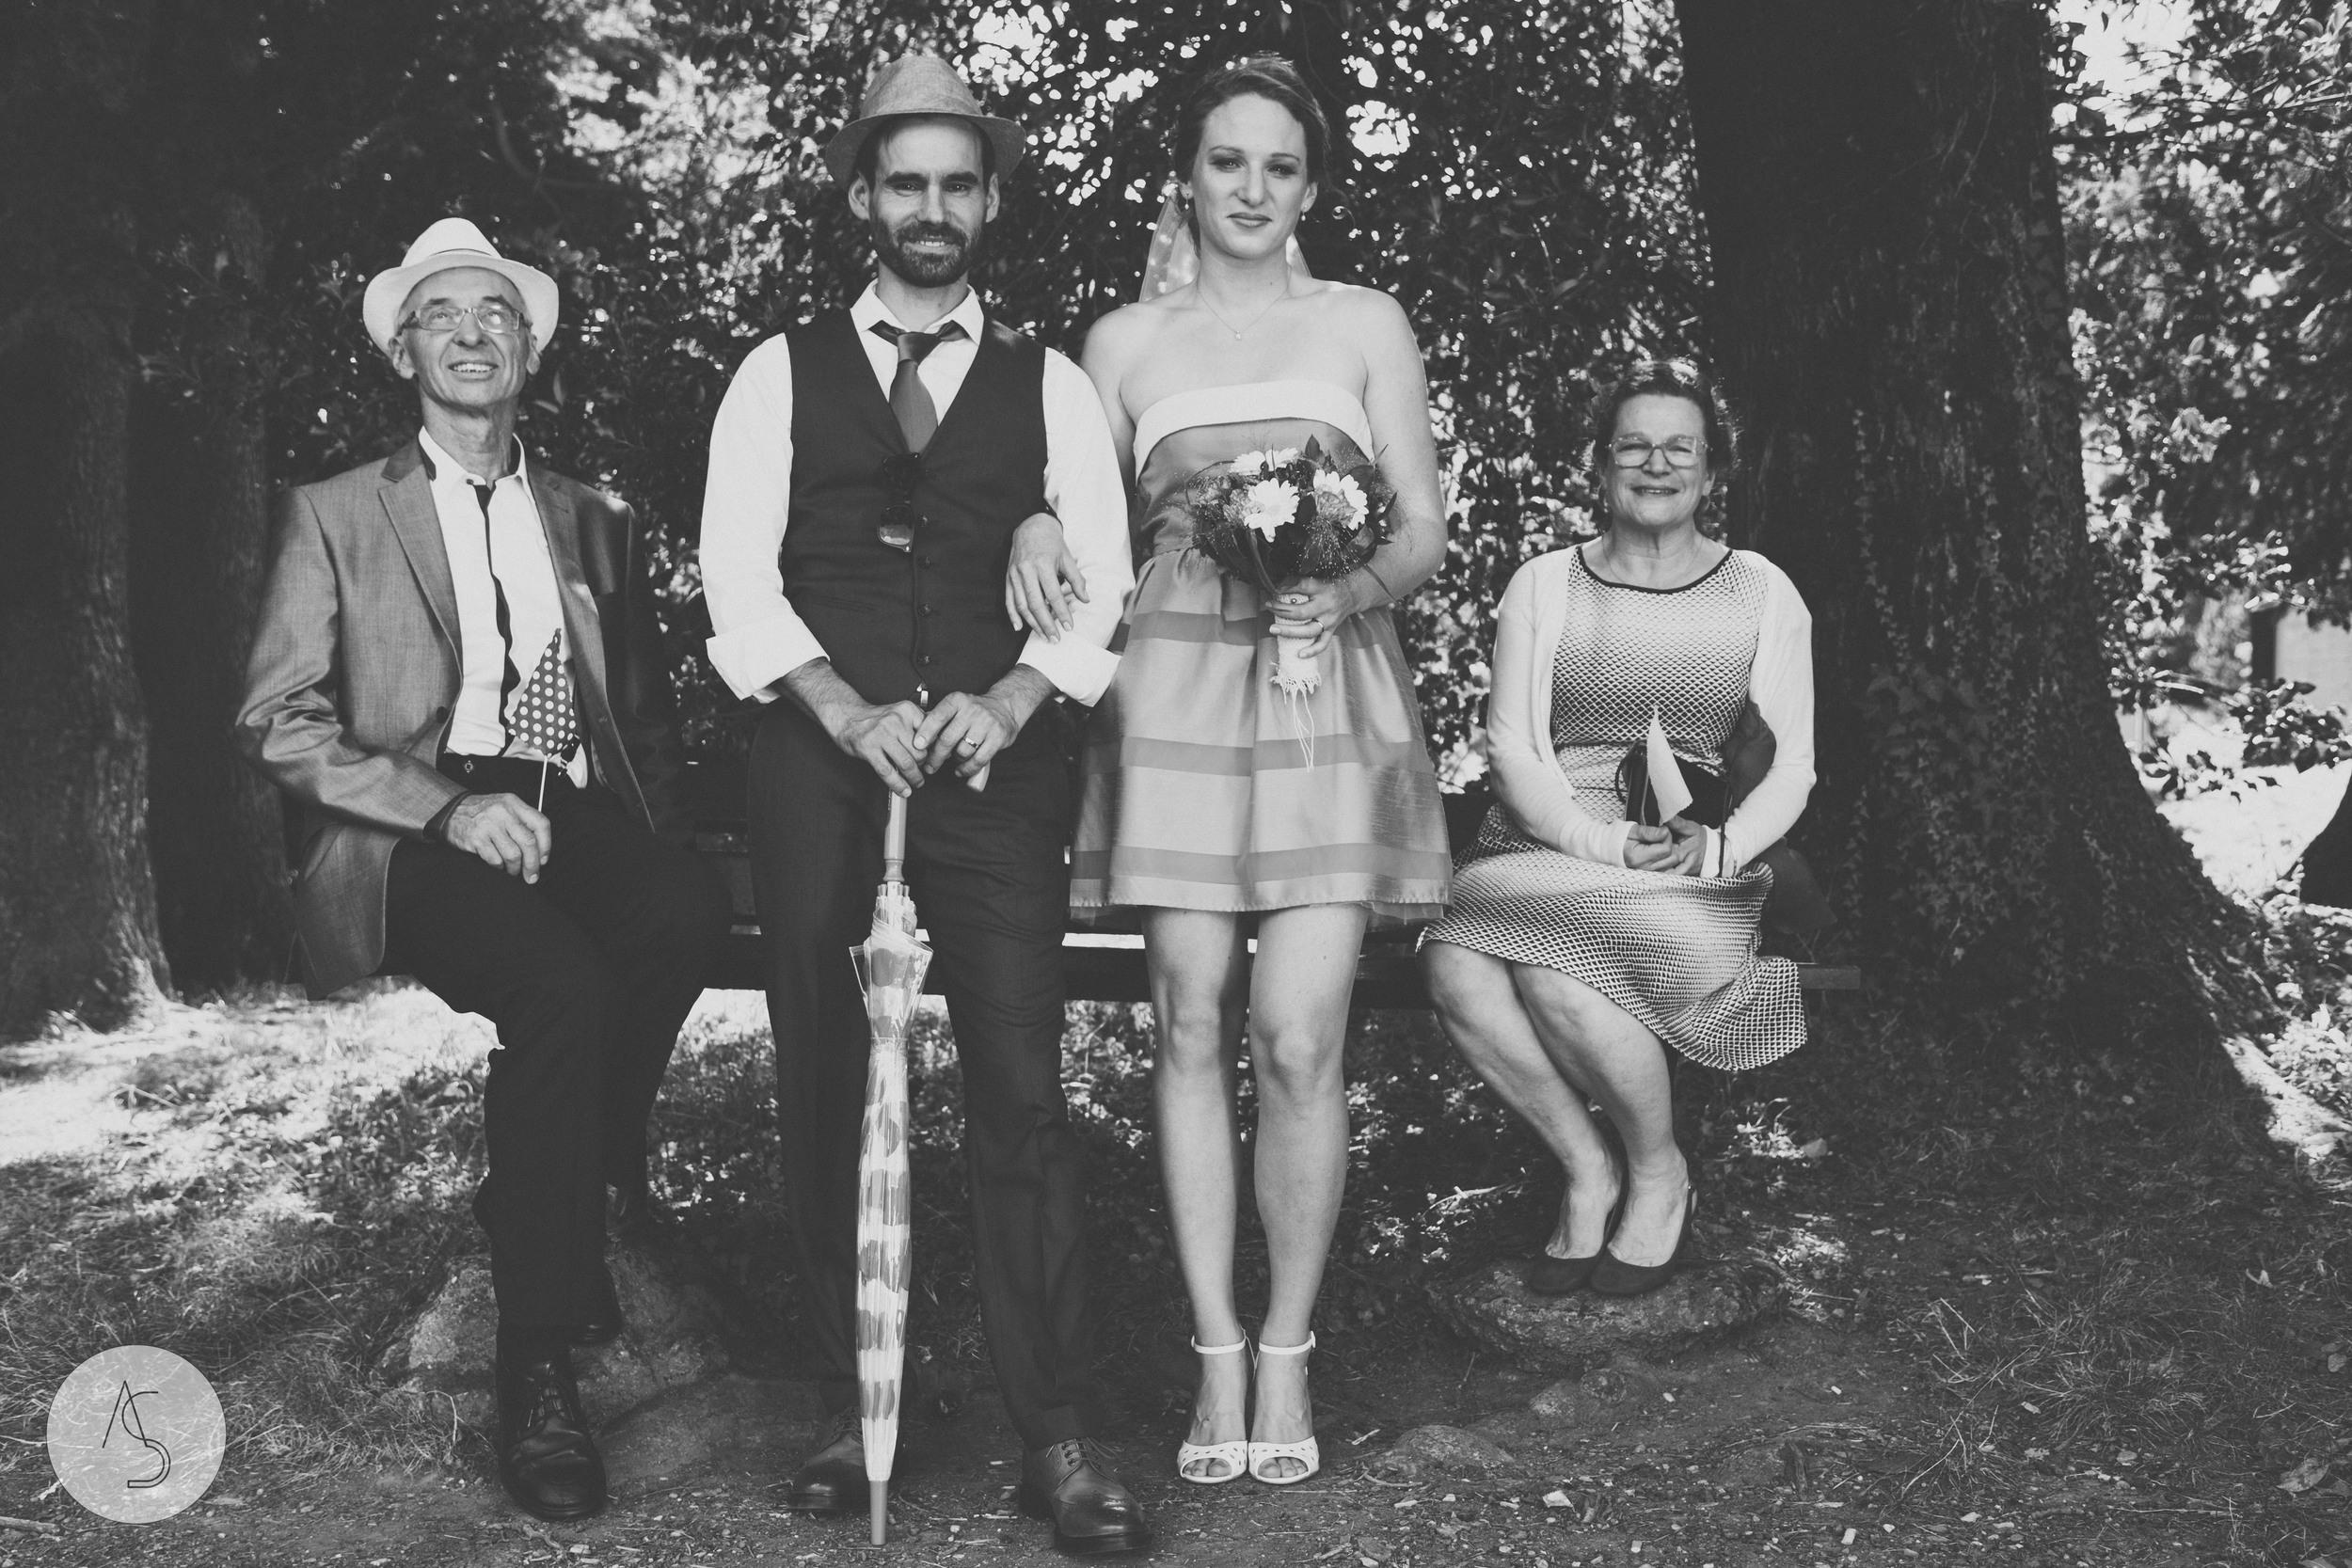 photographe mariage - Grenoble - Rhone Alpes - Adriana Salazar photo-84.jpg